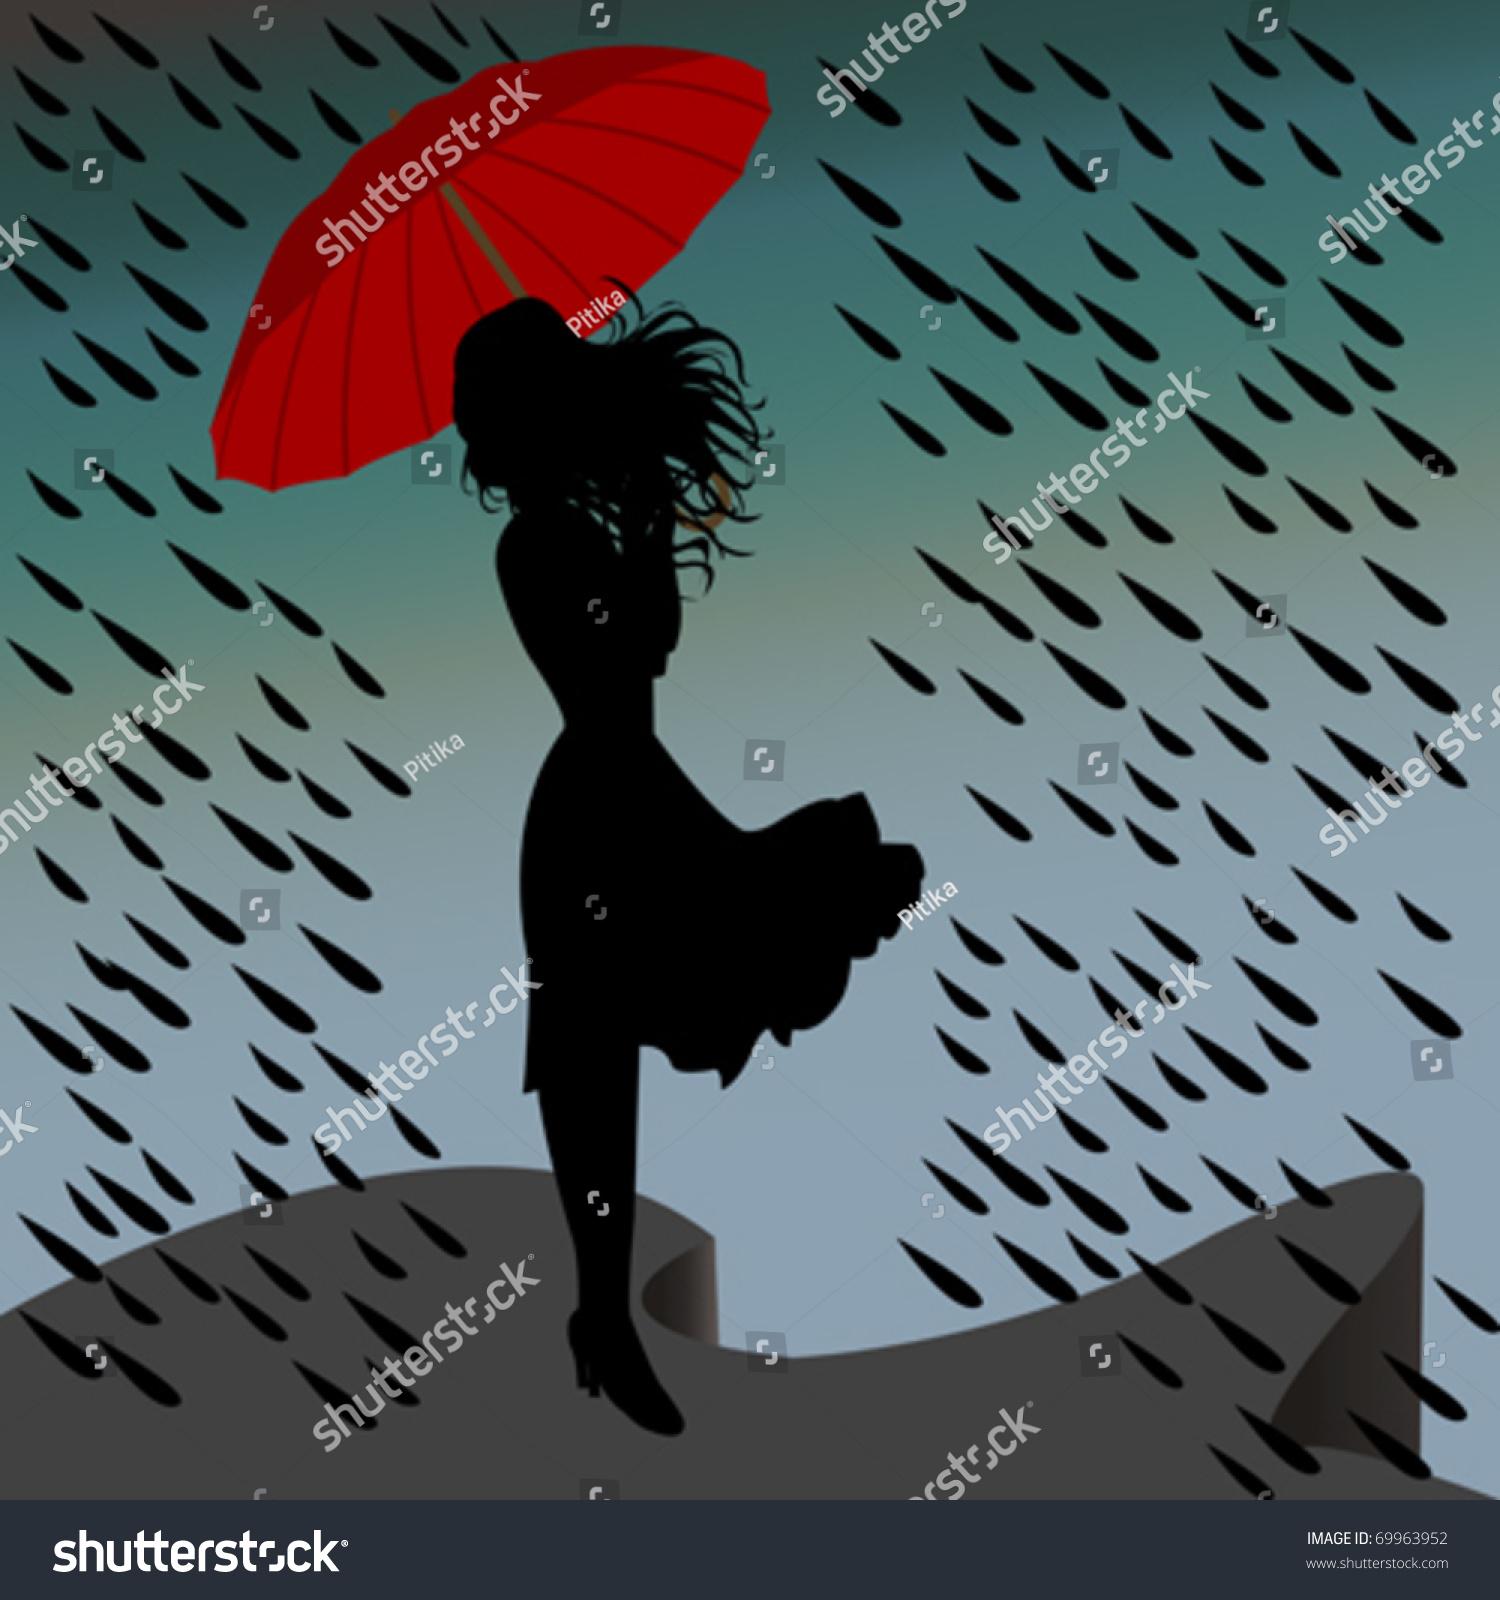 Beautiful woman dancing stripper download more free httpgoogluqm2ha - 2 7